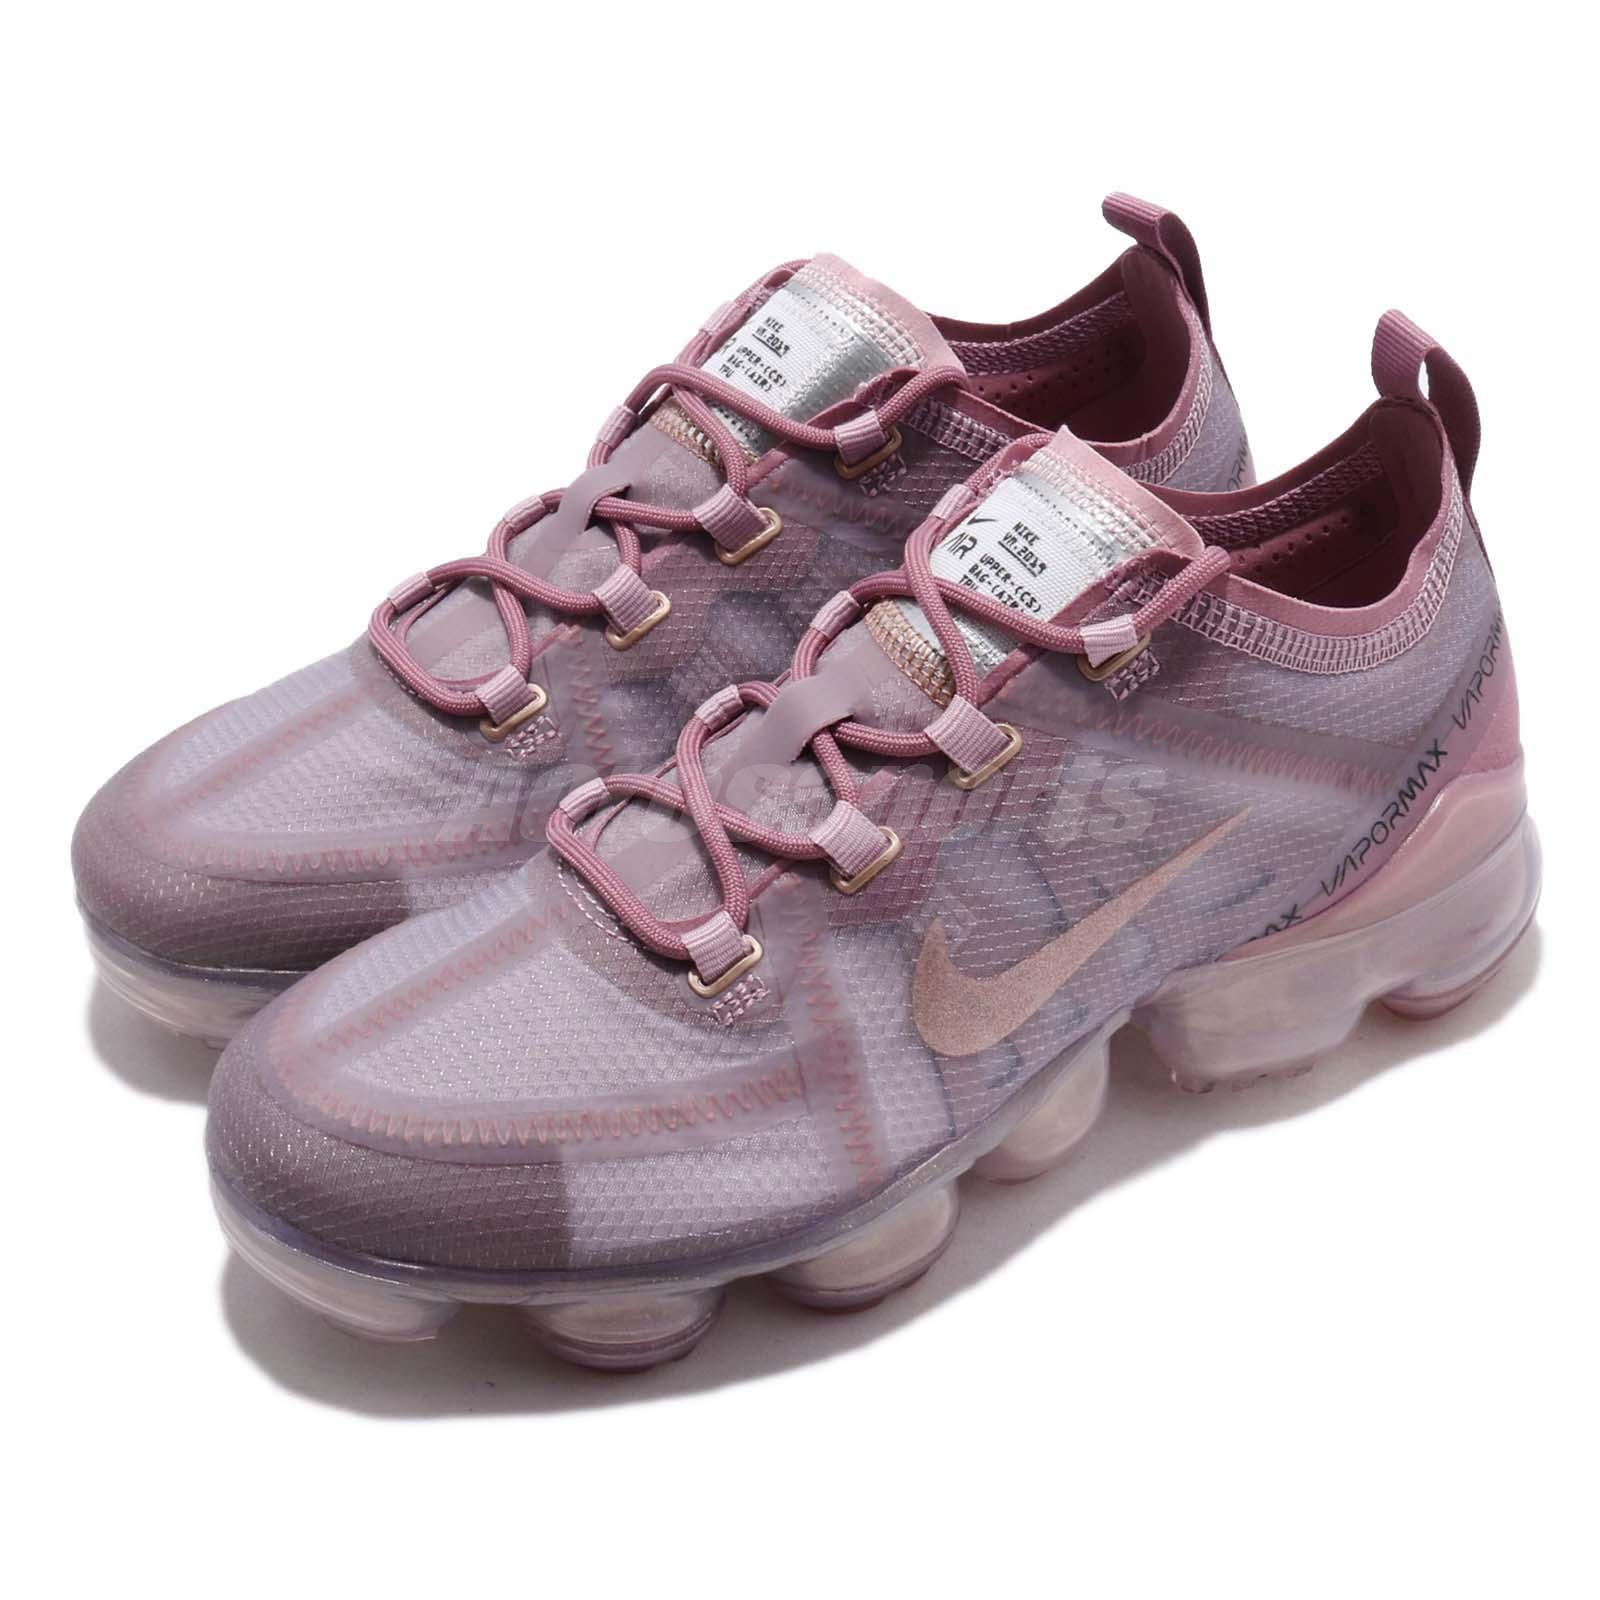 0086992c94bf8 Nike Wmns Air Vapormax 2019 Soft Pink Plum Chalk Dust Women Shoes ... nike